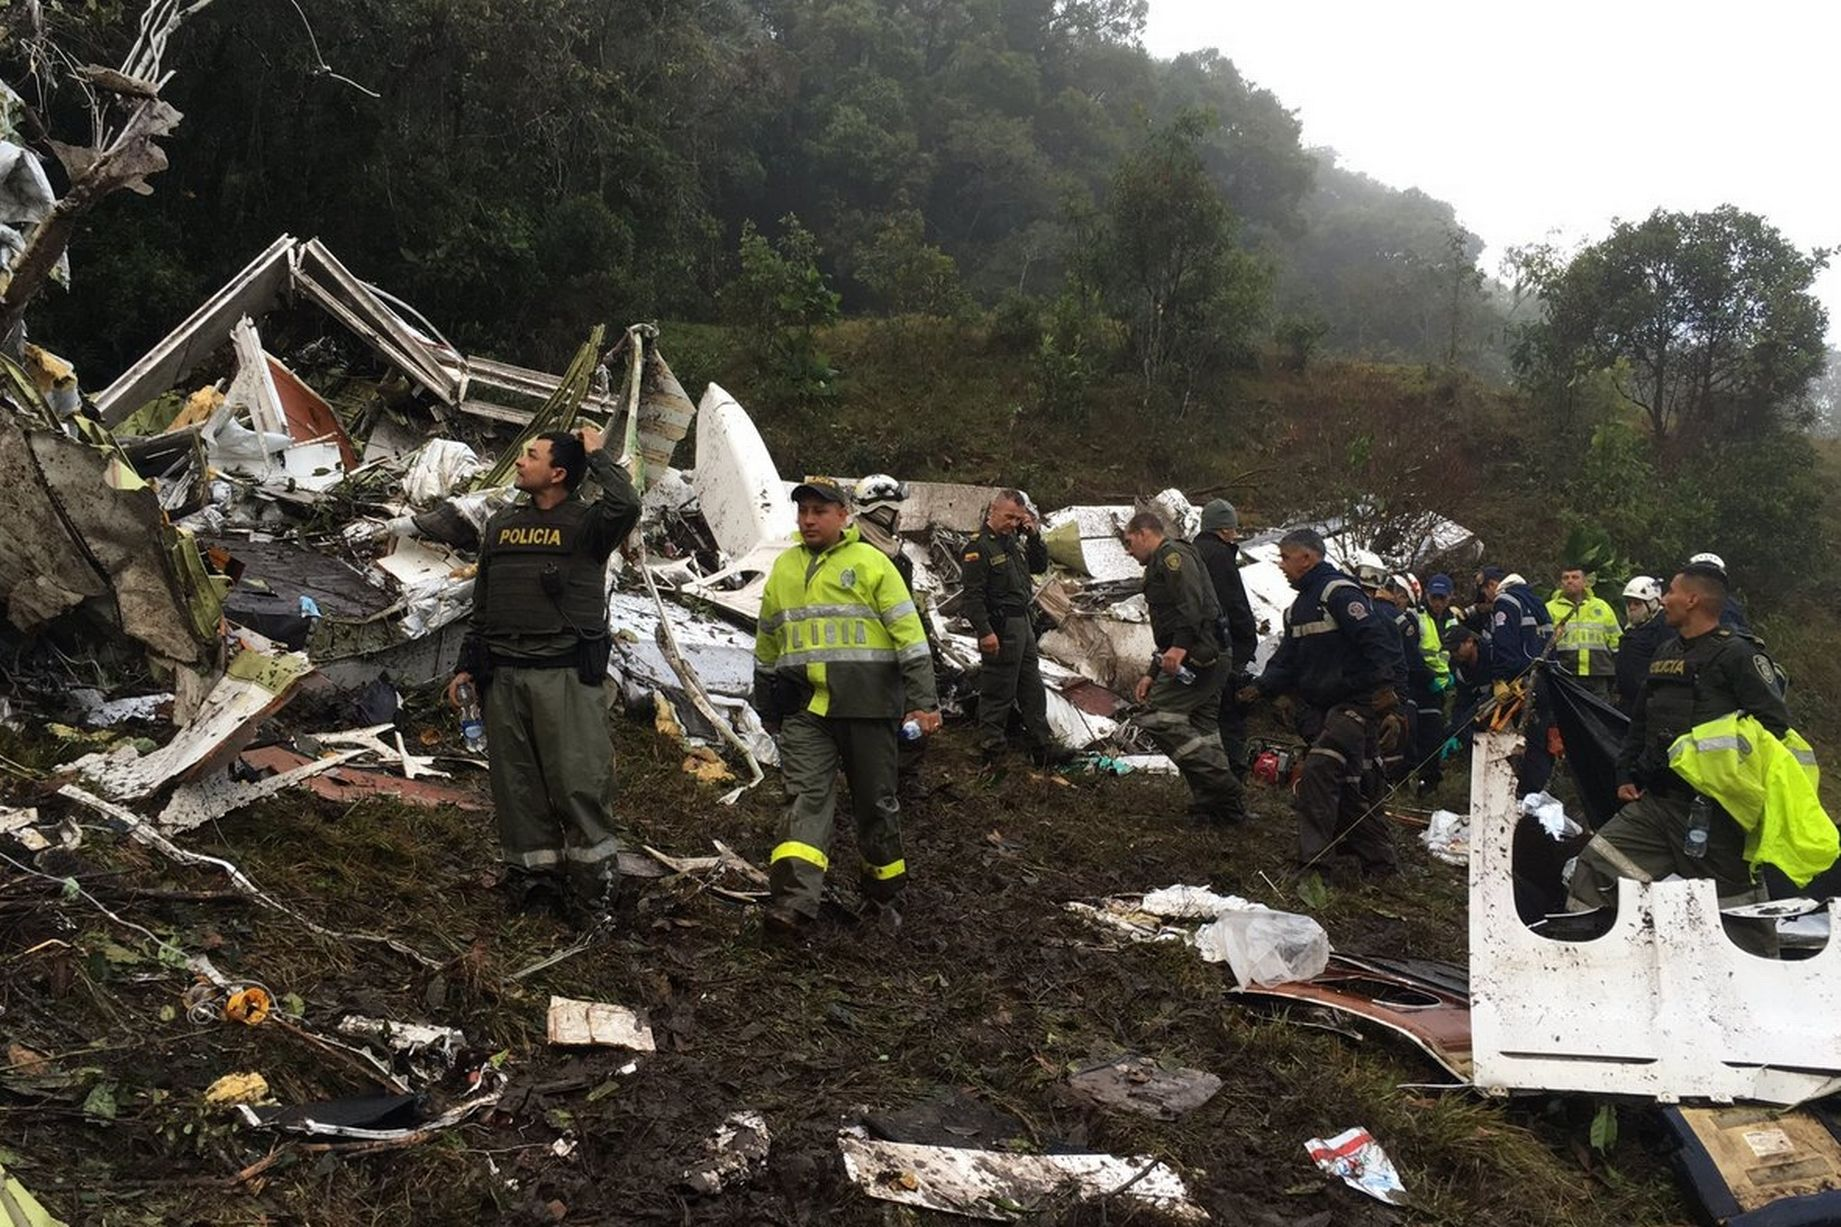 Место трагедии. Фото: Policiantioqula